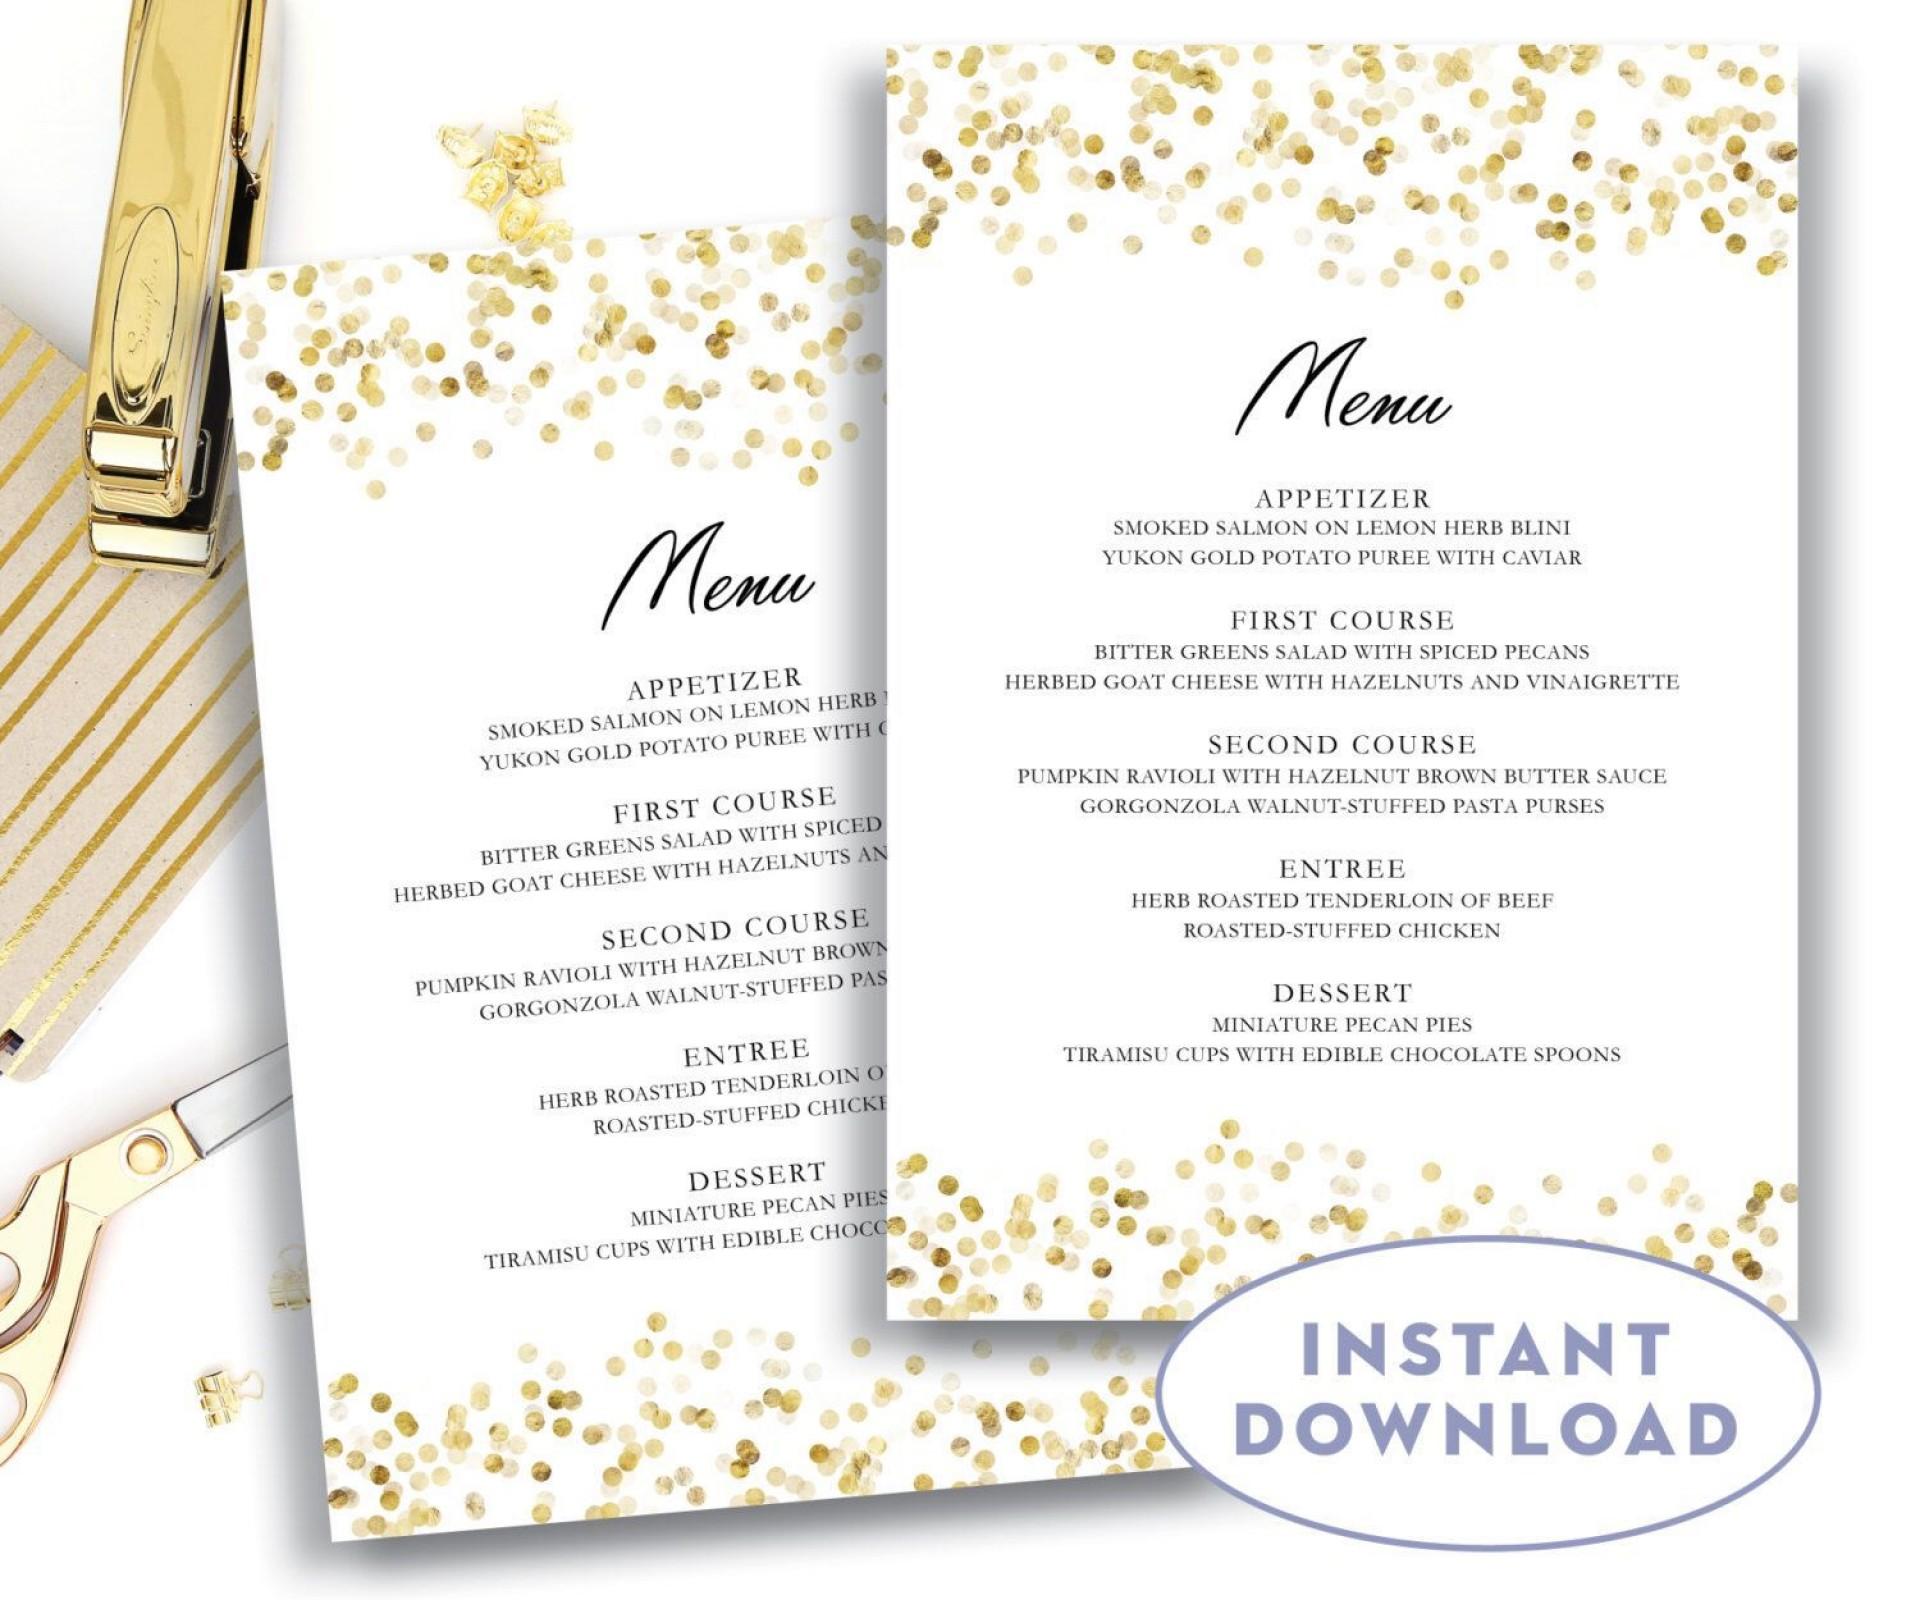 005 Unbelievable Free Online Wedding Menu Template Inspiration  Templates1920